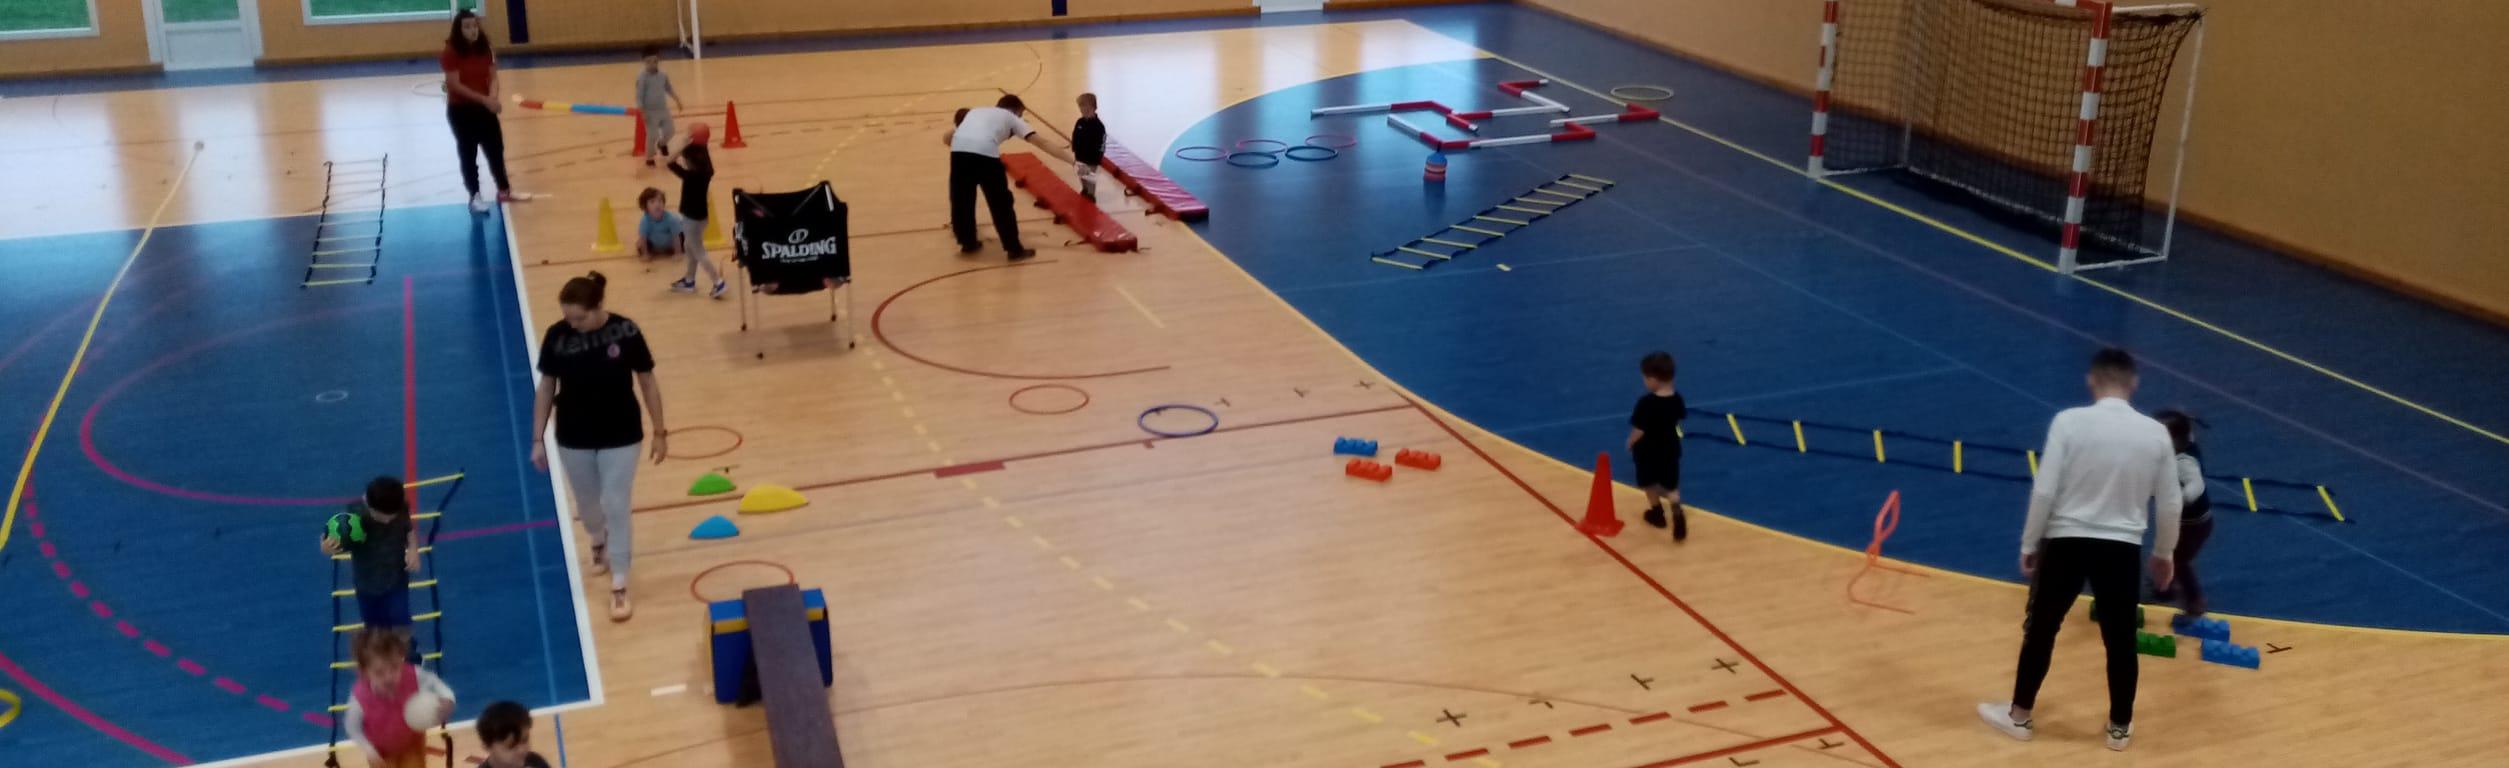 Roanne Riorges Handball